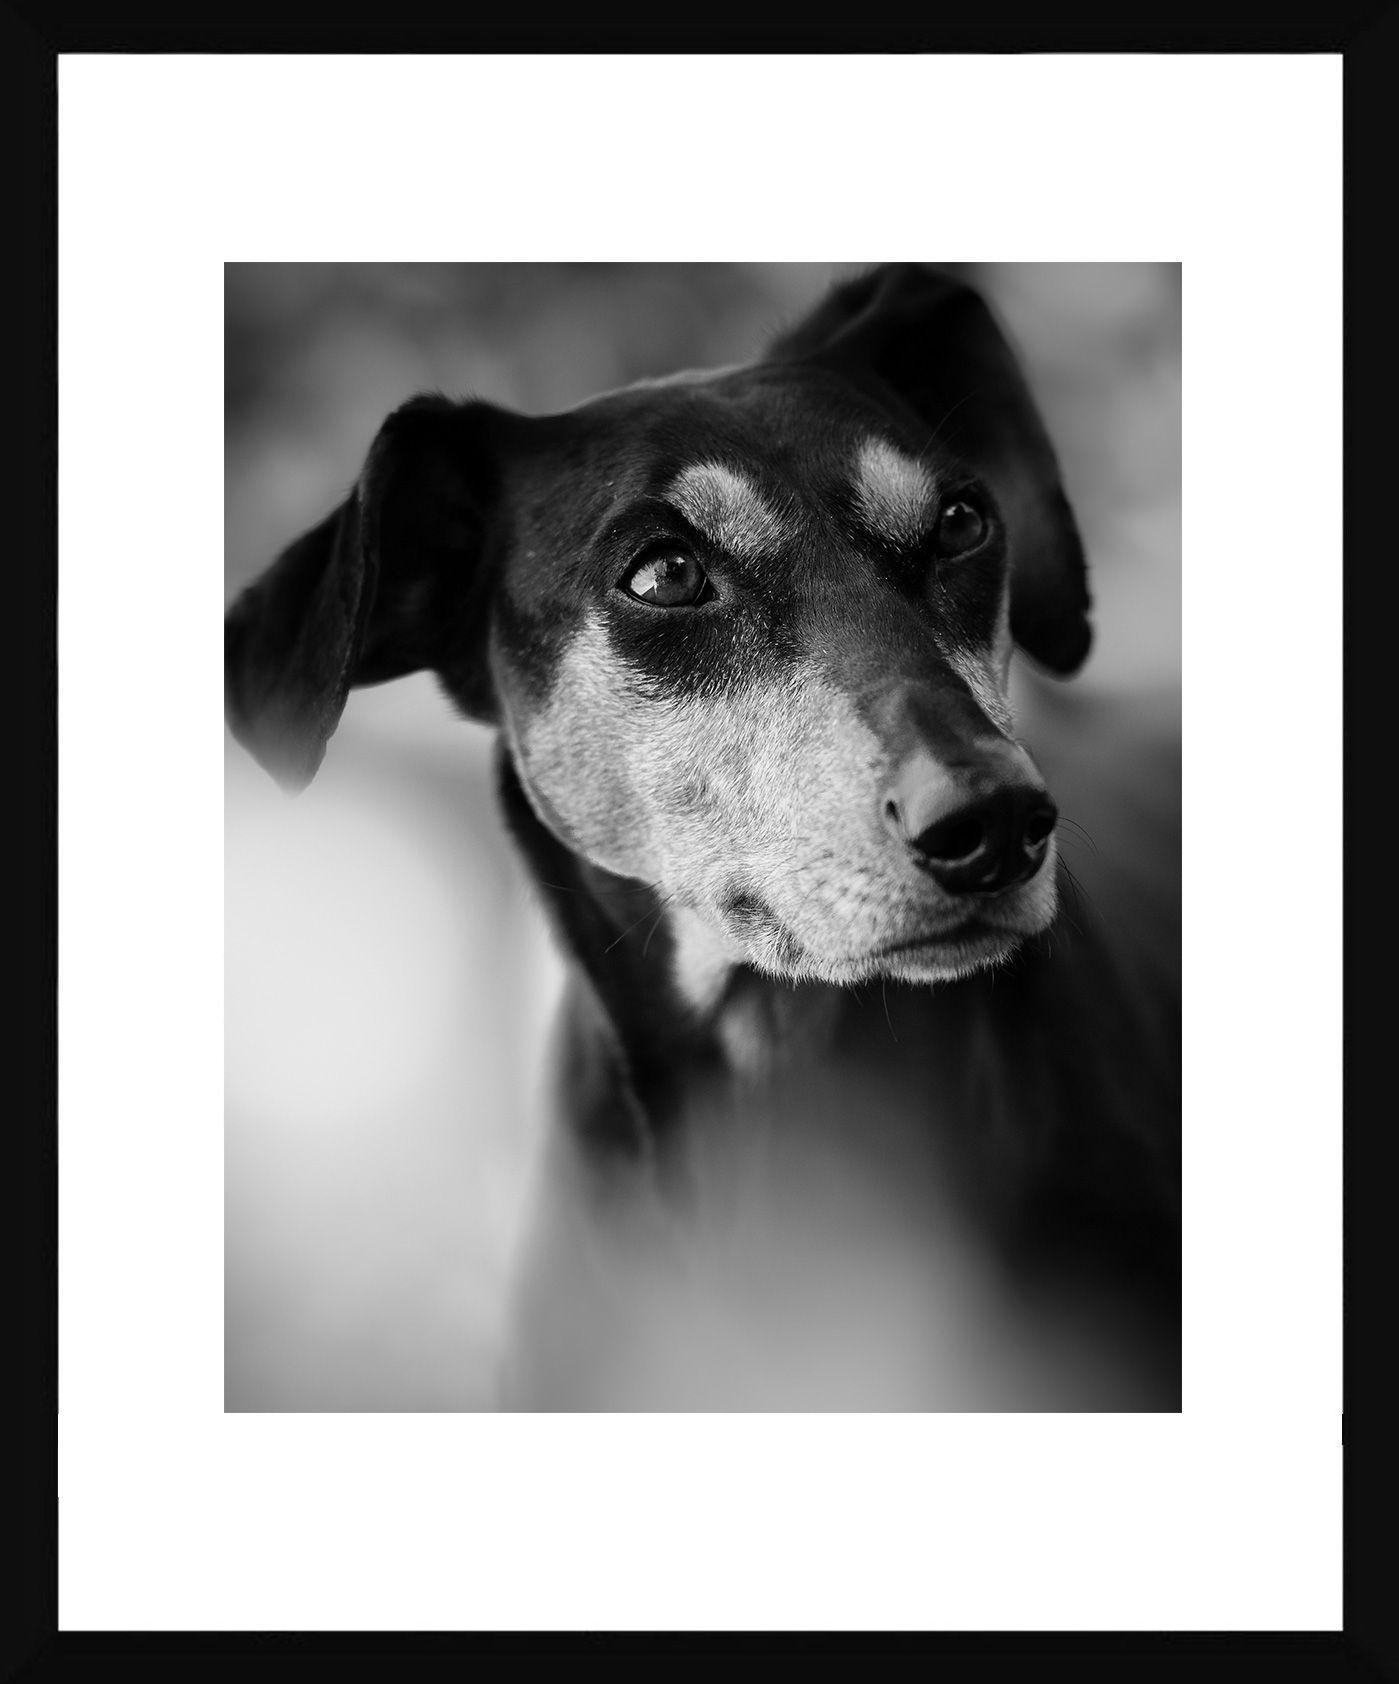 Quadro Decorativo em Preto e Branco Pet Cachorro da Raça Pinscher 50x60cm -  Decore Pronto 809d3e8f5c897